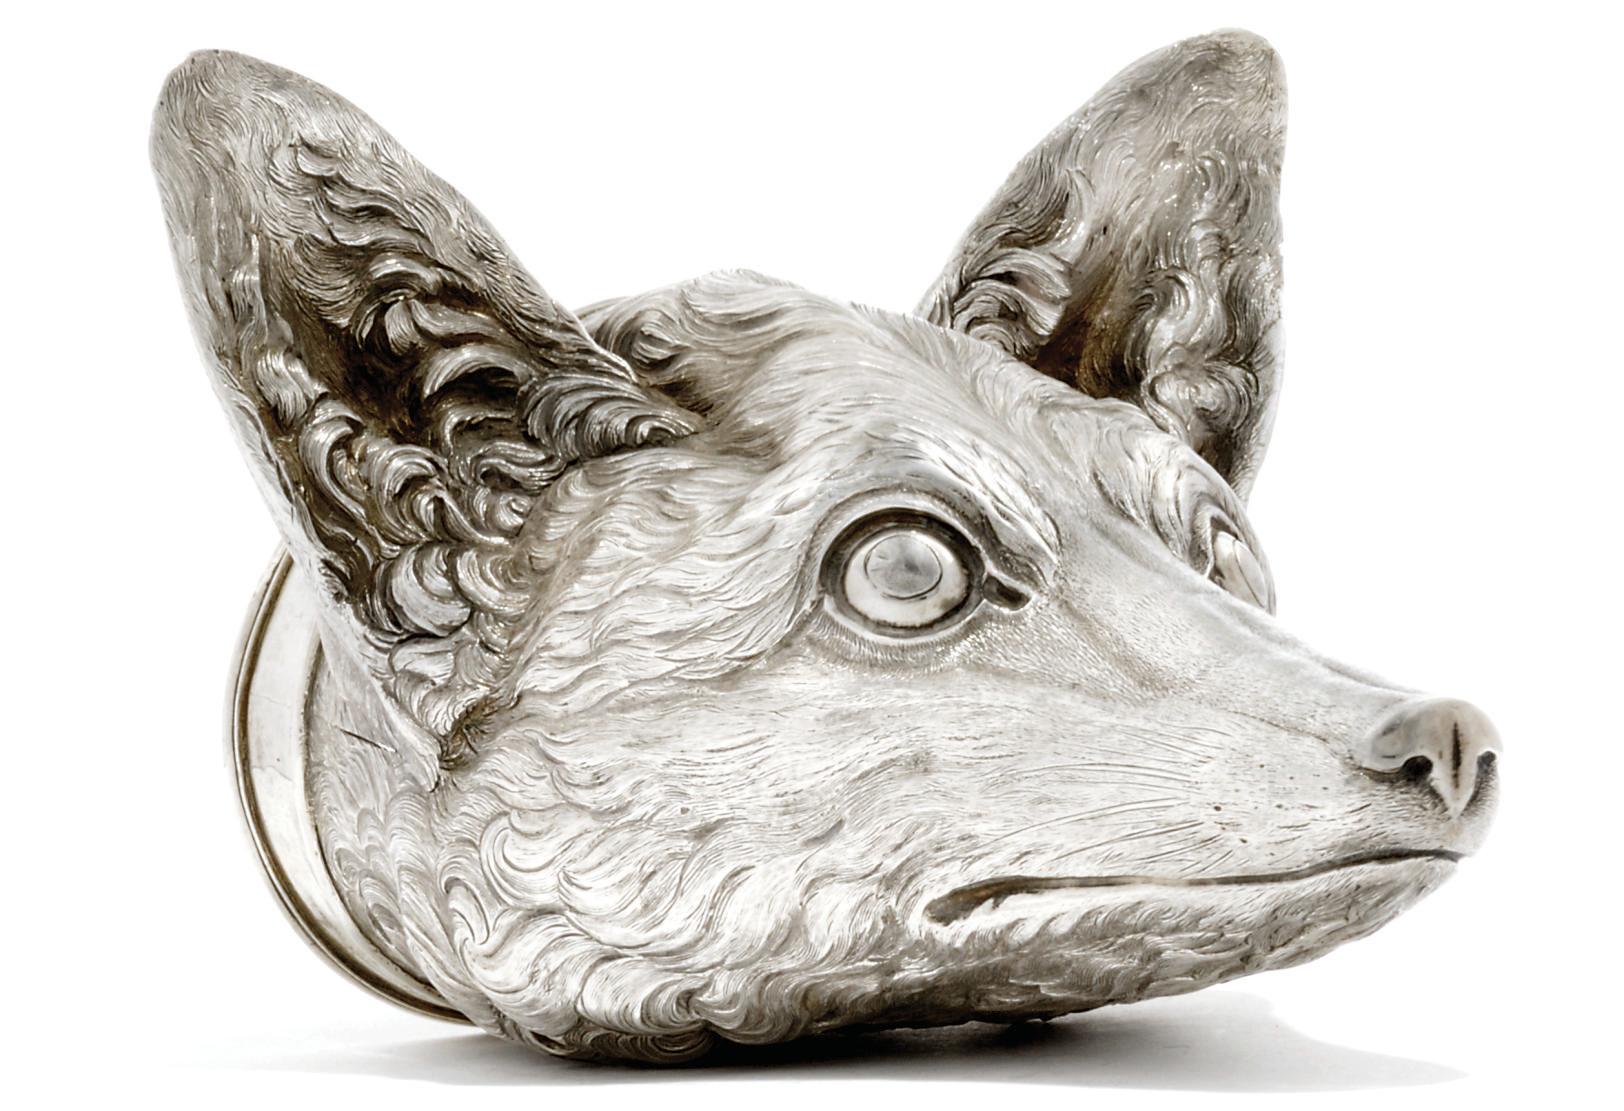 A GEORGE IV SILVER STIRRUP CUP MODELLED AS A FOX'S HEAD